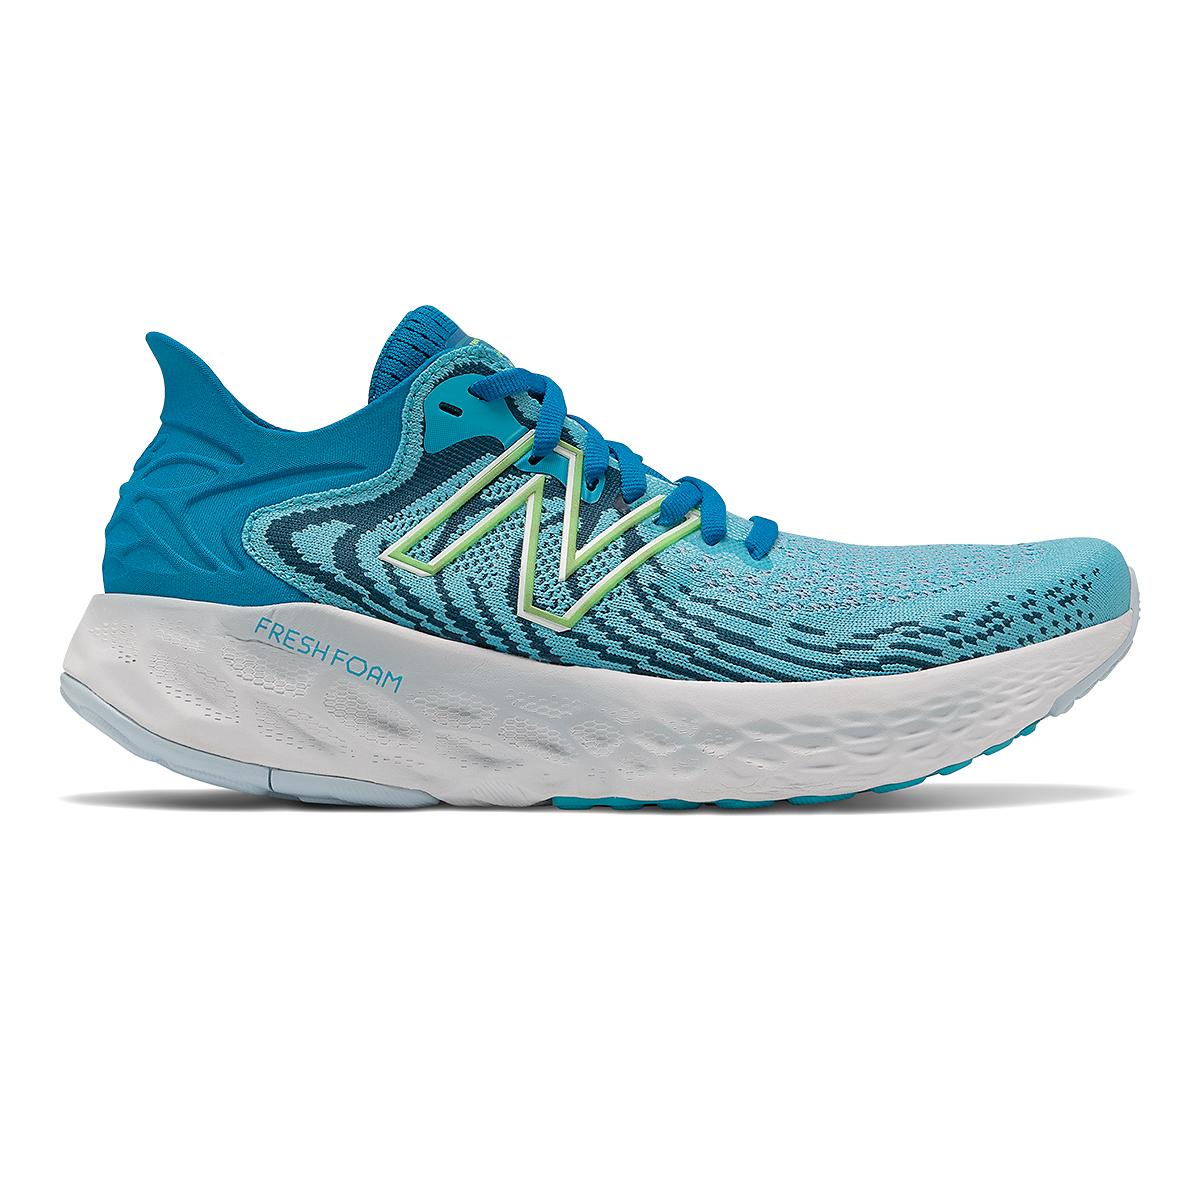 Women's New Balance Fresh Foam 1080v11 Running Shoe - Color: Virtual Sky/Bleached Lime Glo - Size: 5 - Width: Narrow, Virtual Sky/Bleached Lime Glo, large, image 1